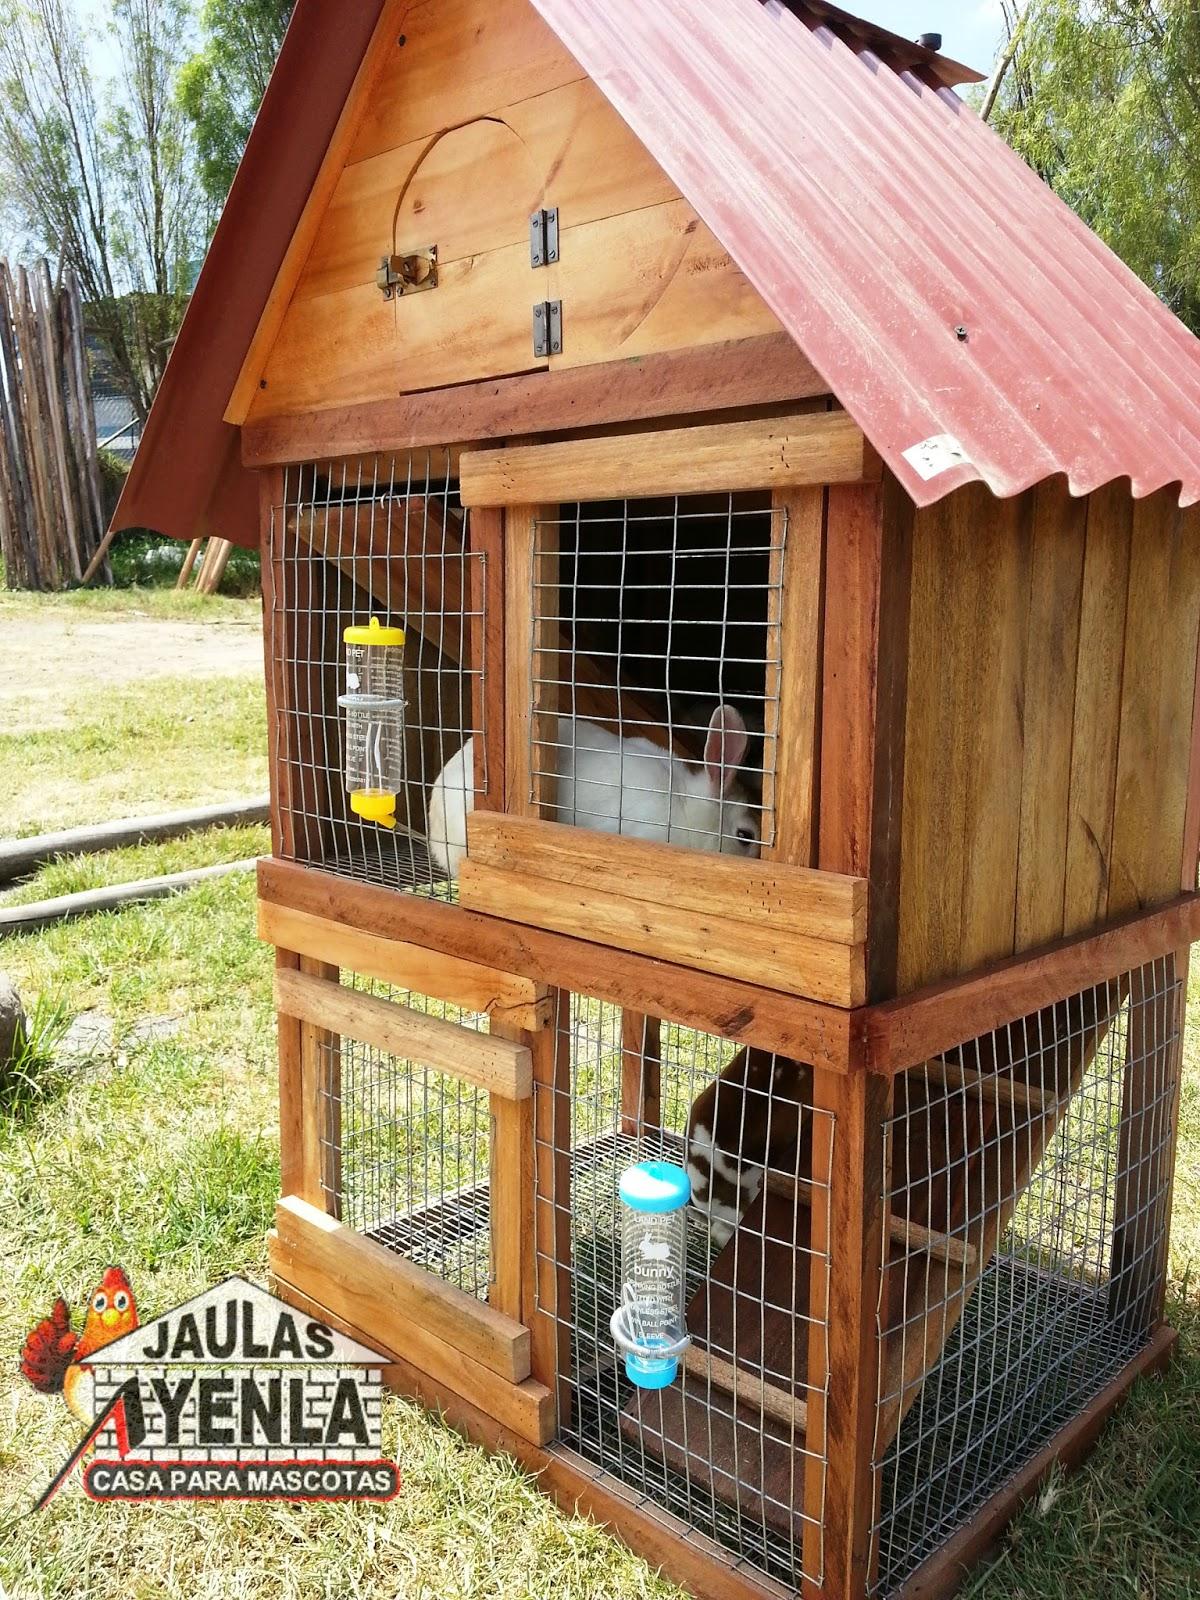 Jaulas ayenla casas de mascotas jaula de conejo de 3 pisos - Casa conejo ...